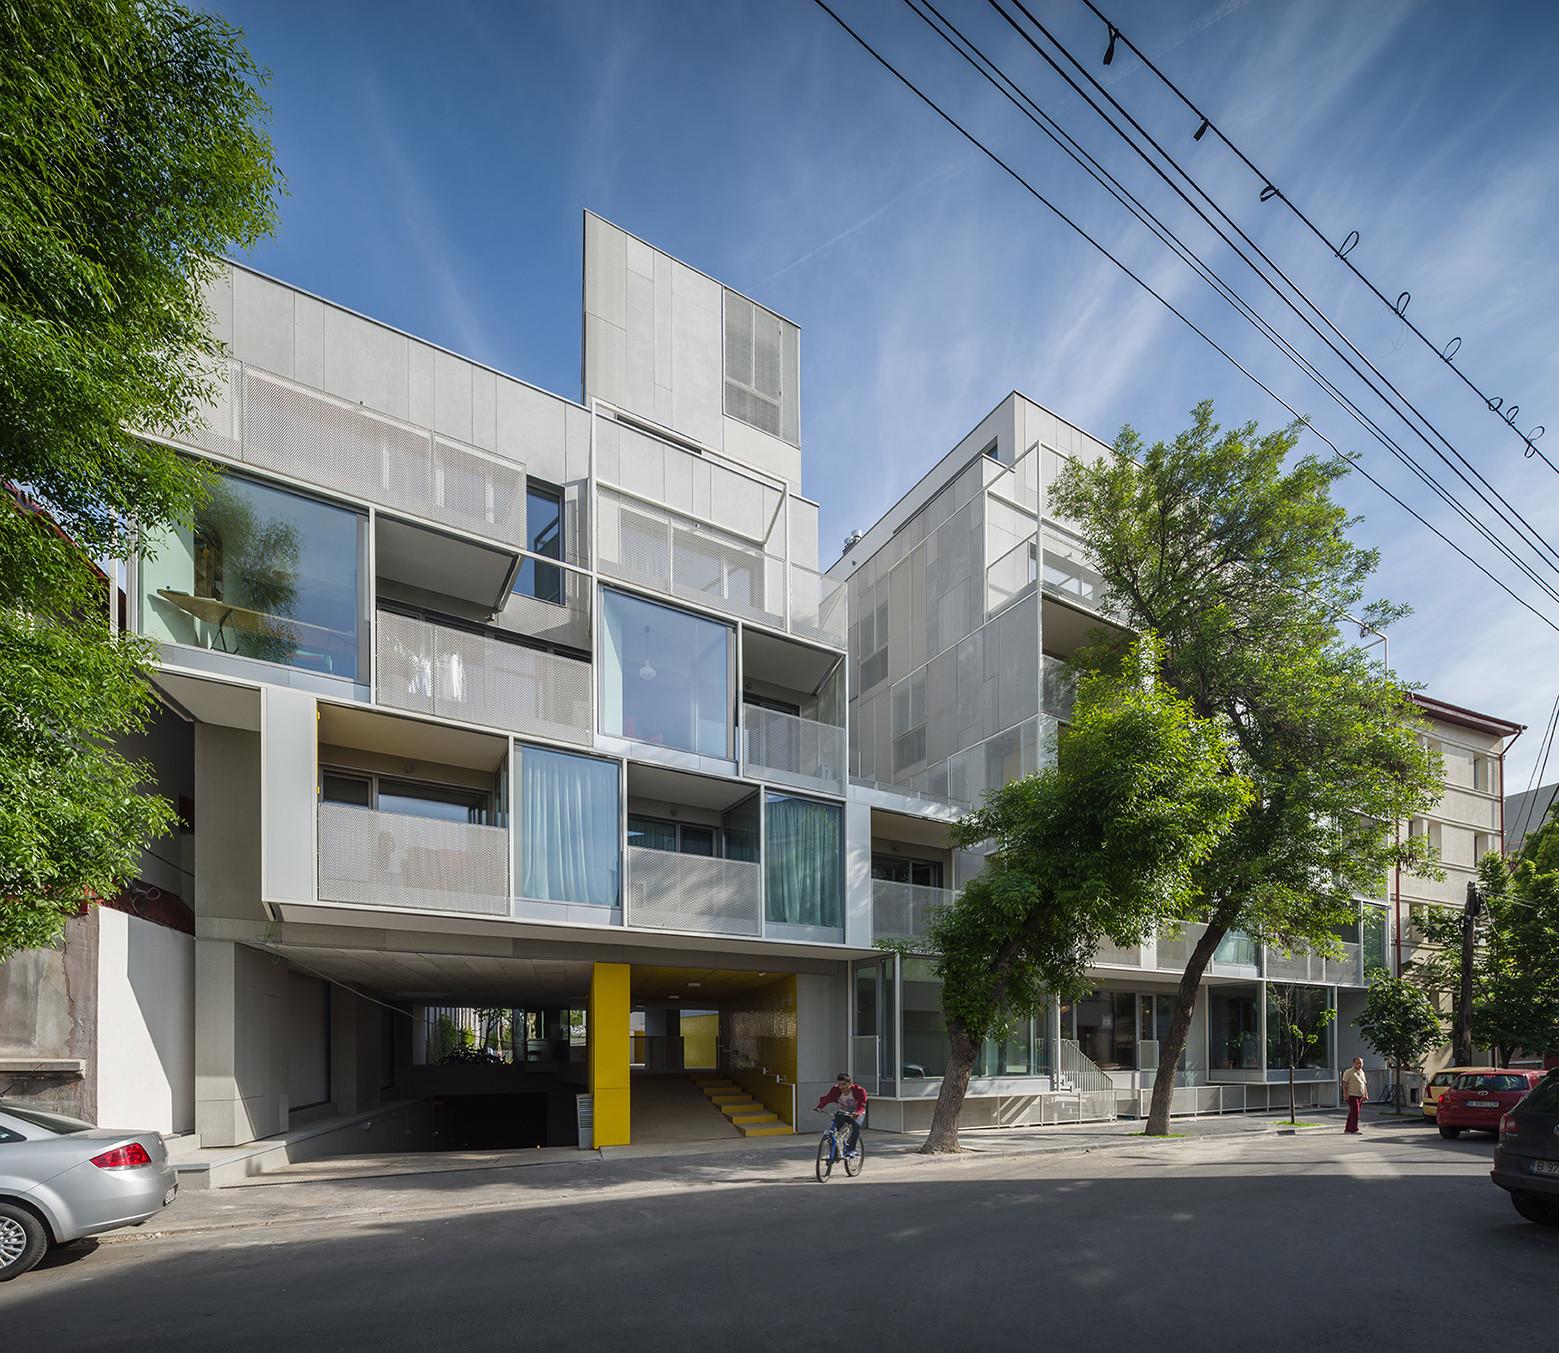 Dogarilor Apartment Building / ADN Birou de Arhitectura, © Cosmin Dragomir